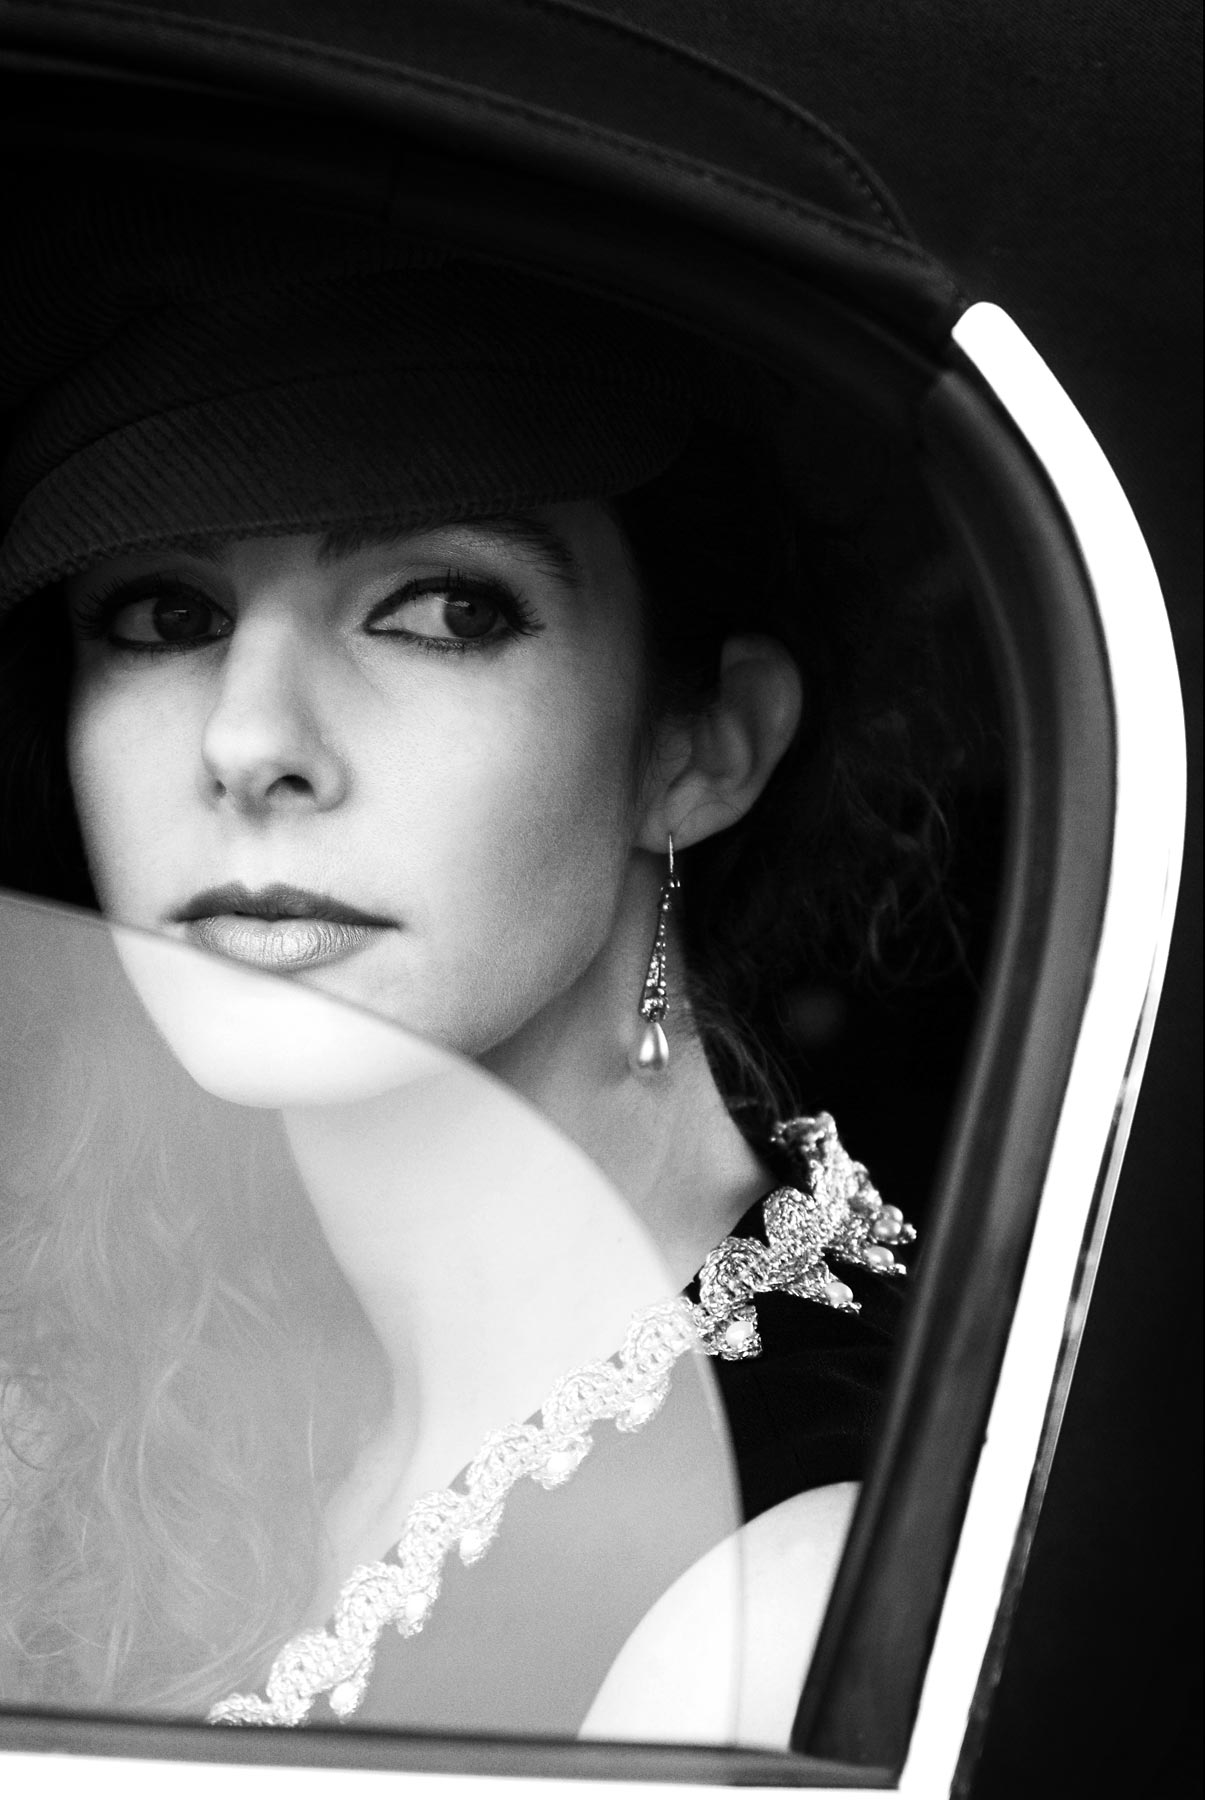 A girl in an Etype Jaguar mk1